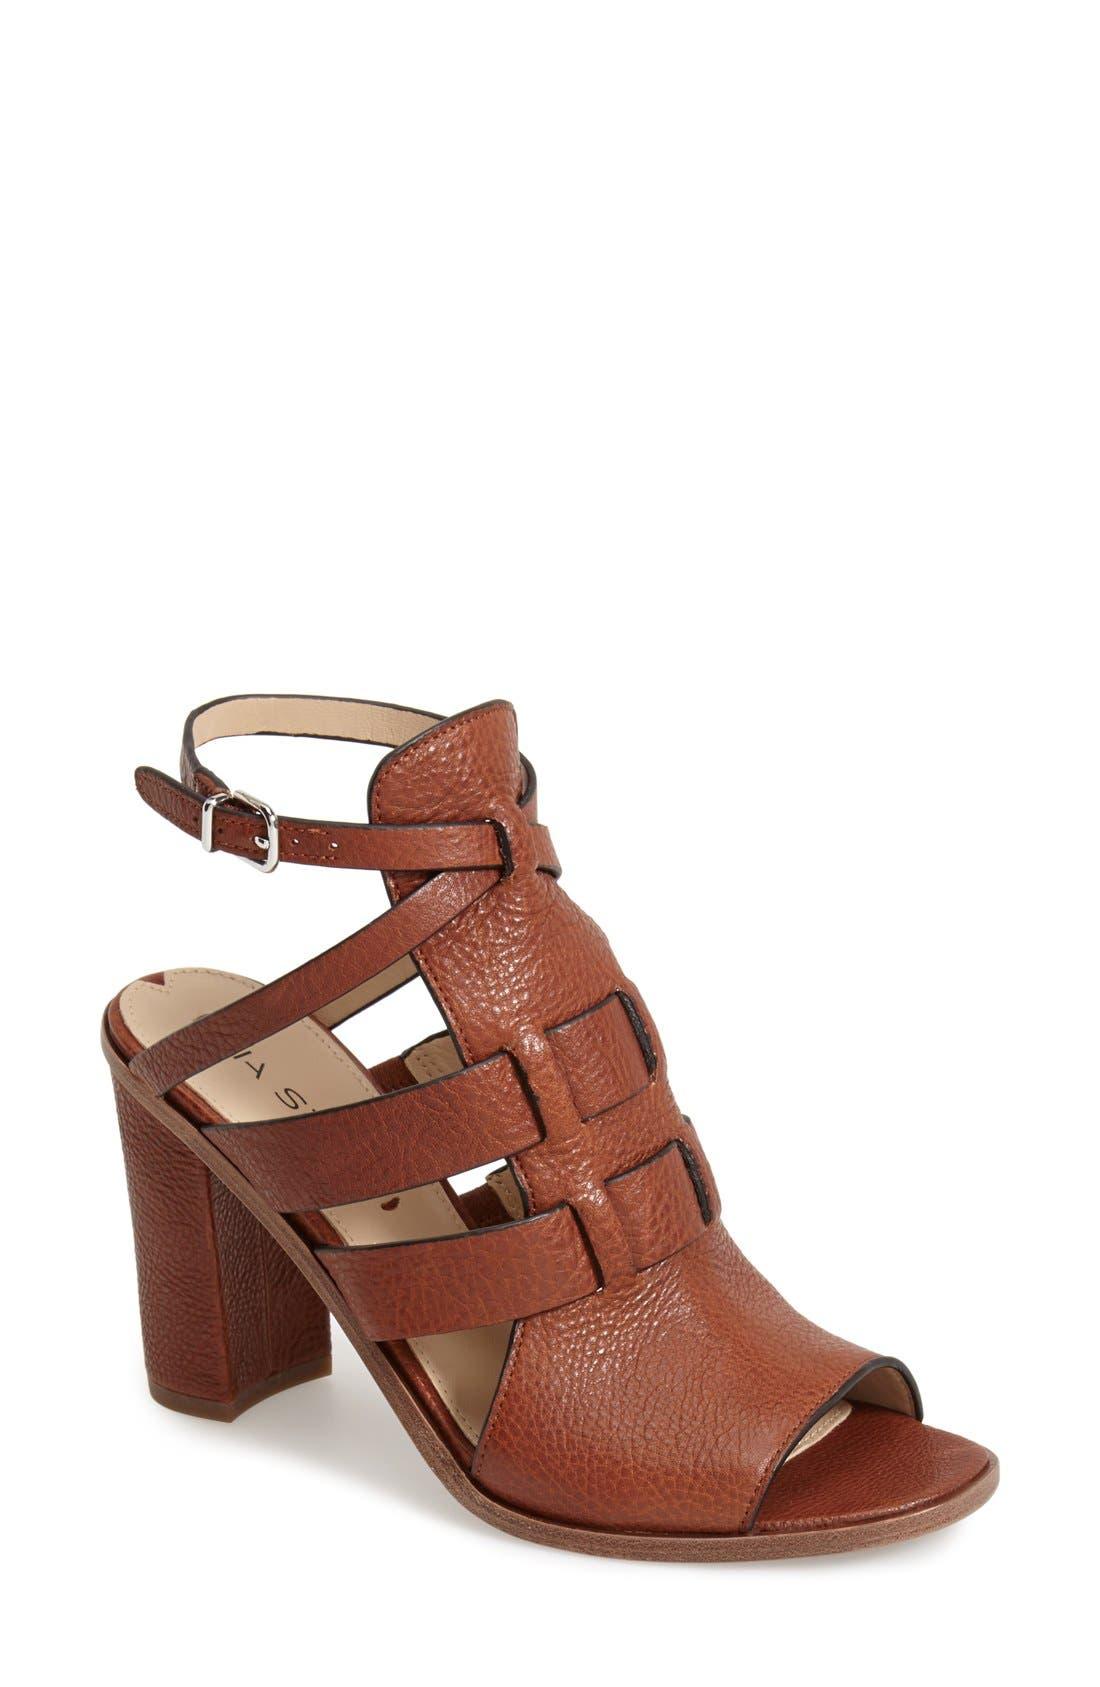 Alternate Image 1 Selected - Via Spiga 'Brandina' Leather Sandal (Women)